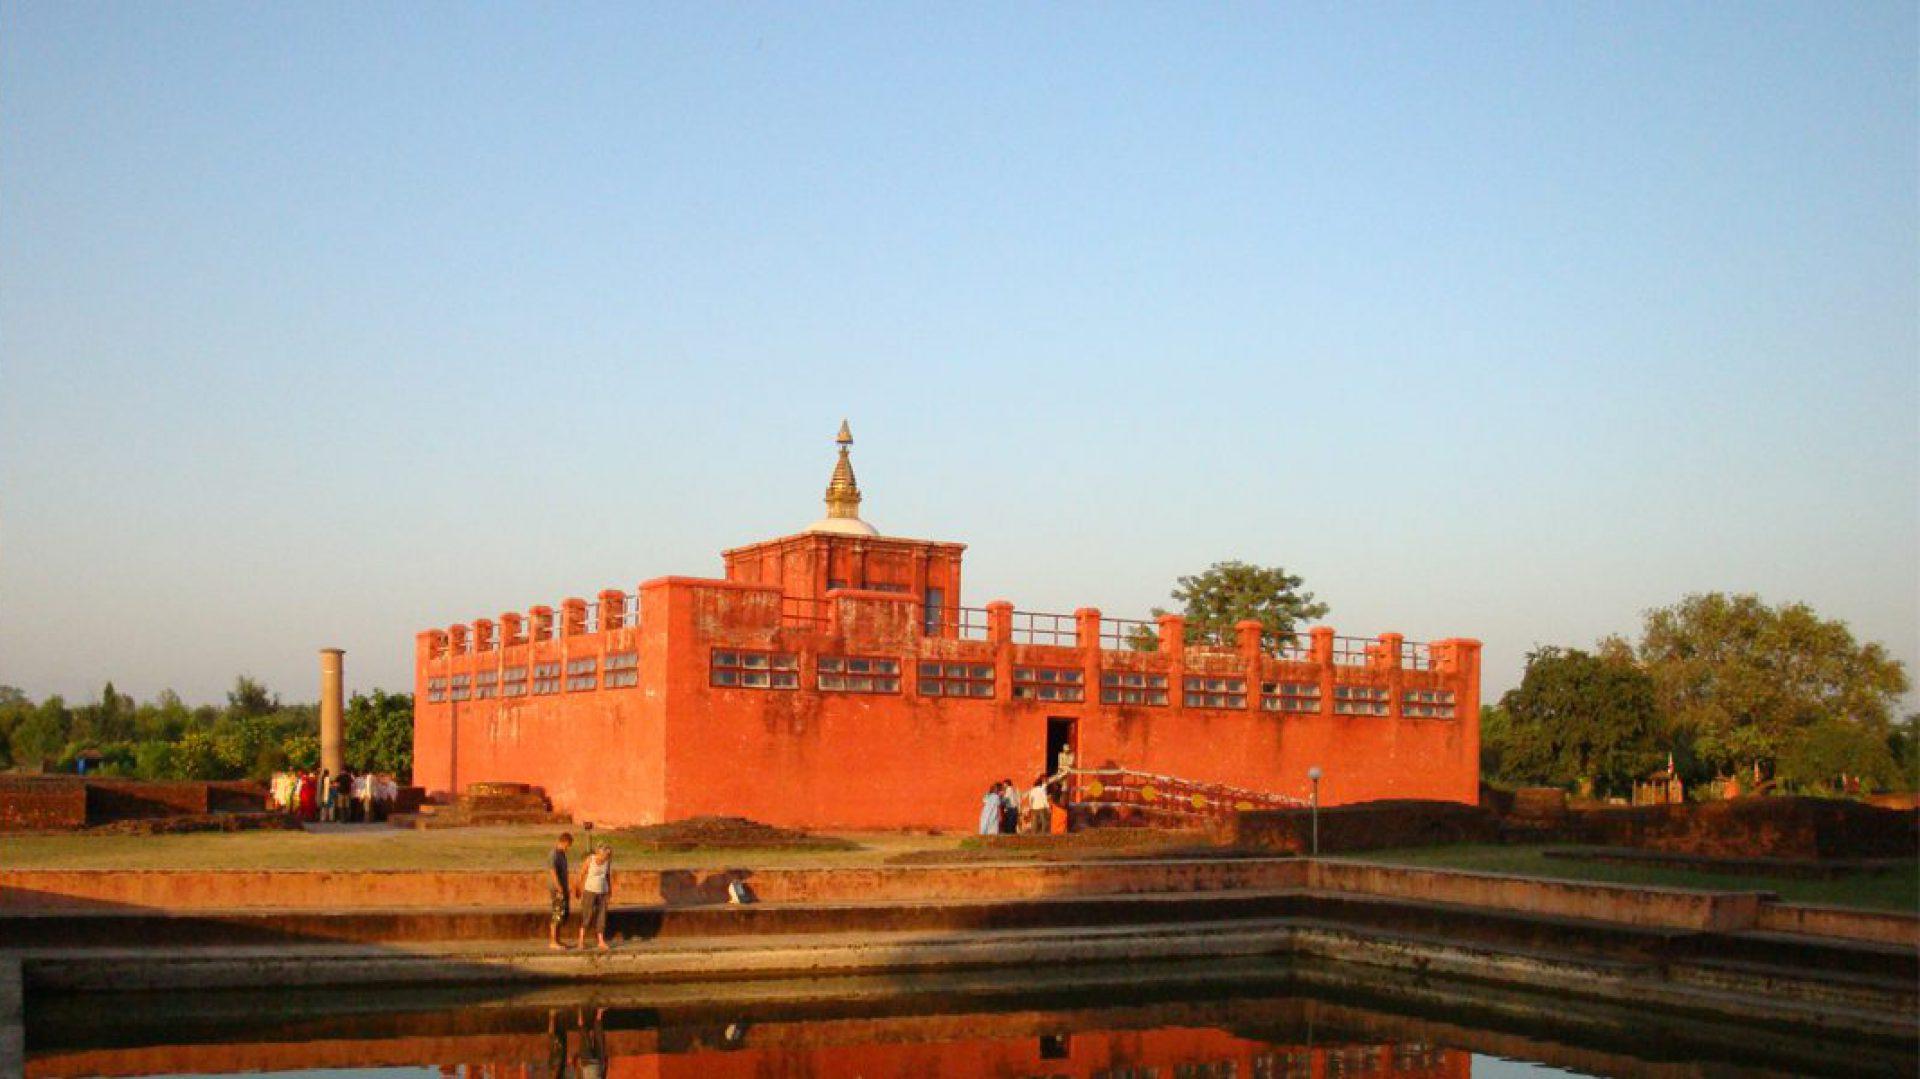 Haus Siddharta